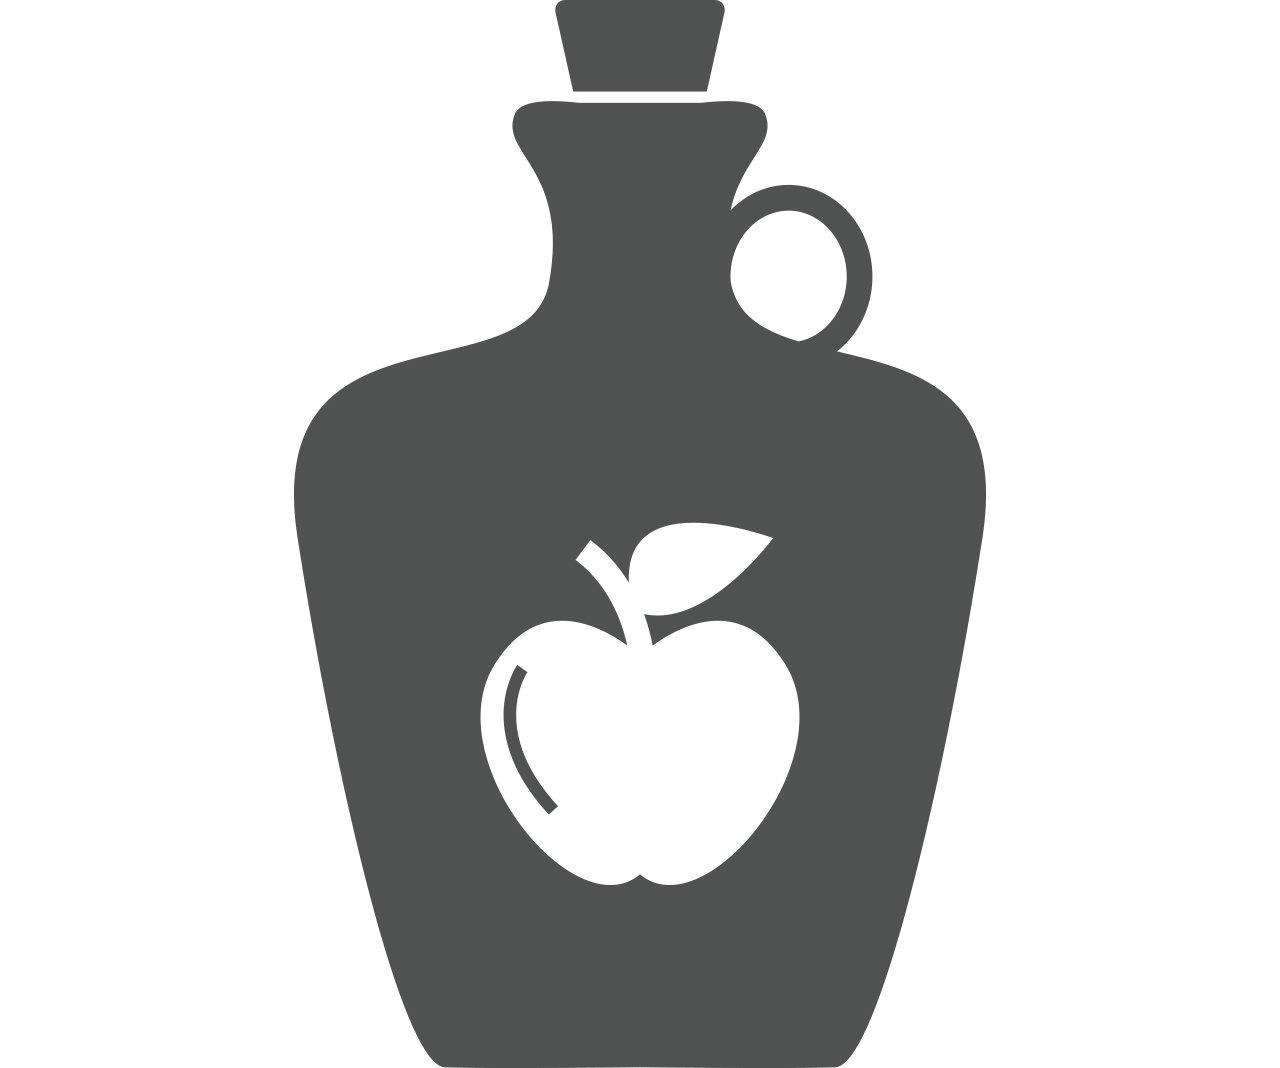 Ingredient for Organic Raw Apple Cider Vinegar